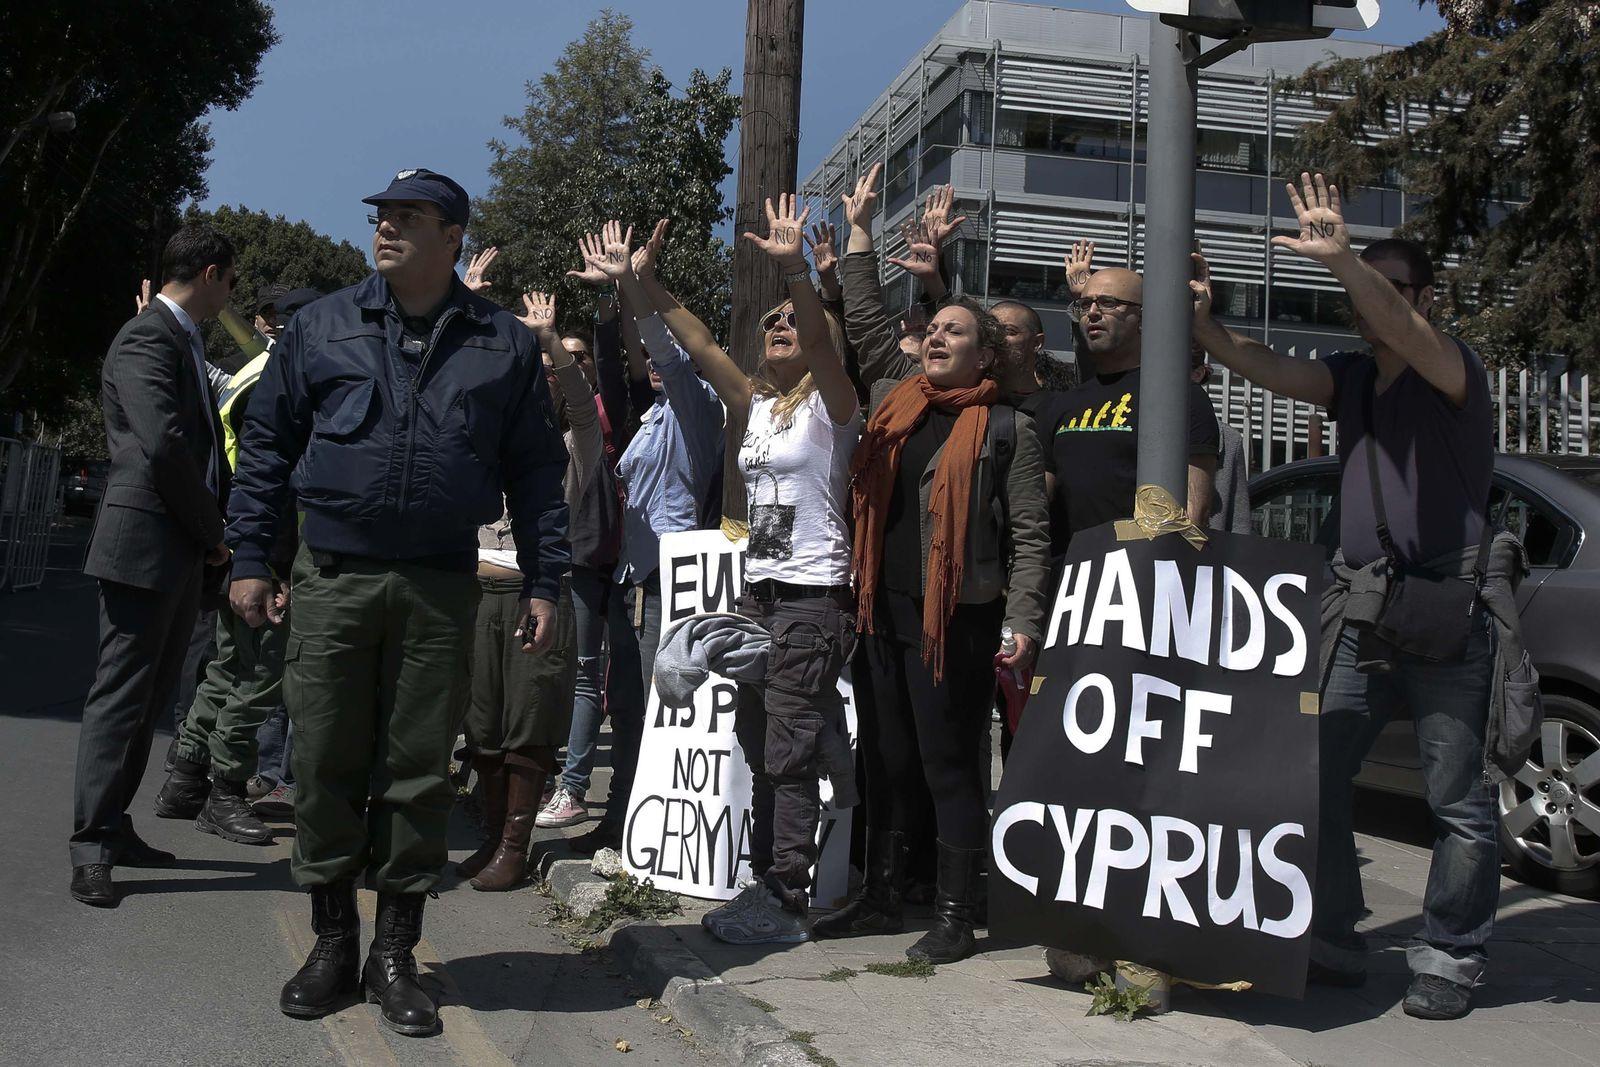 Zypern / Proteste gegen Zwangsabgabe